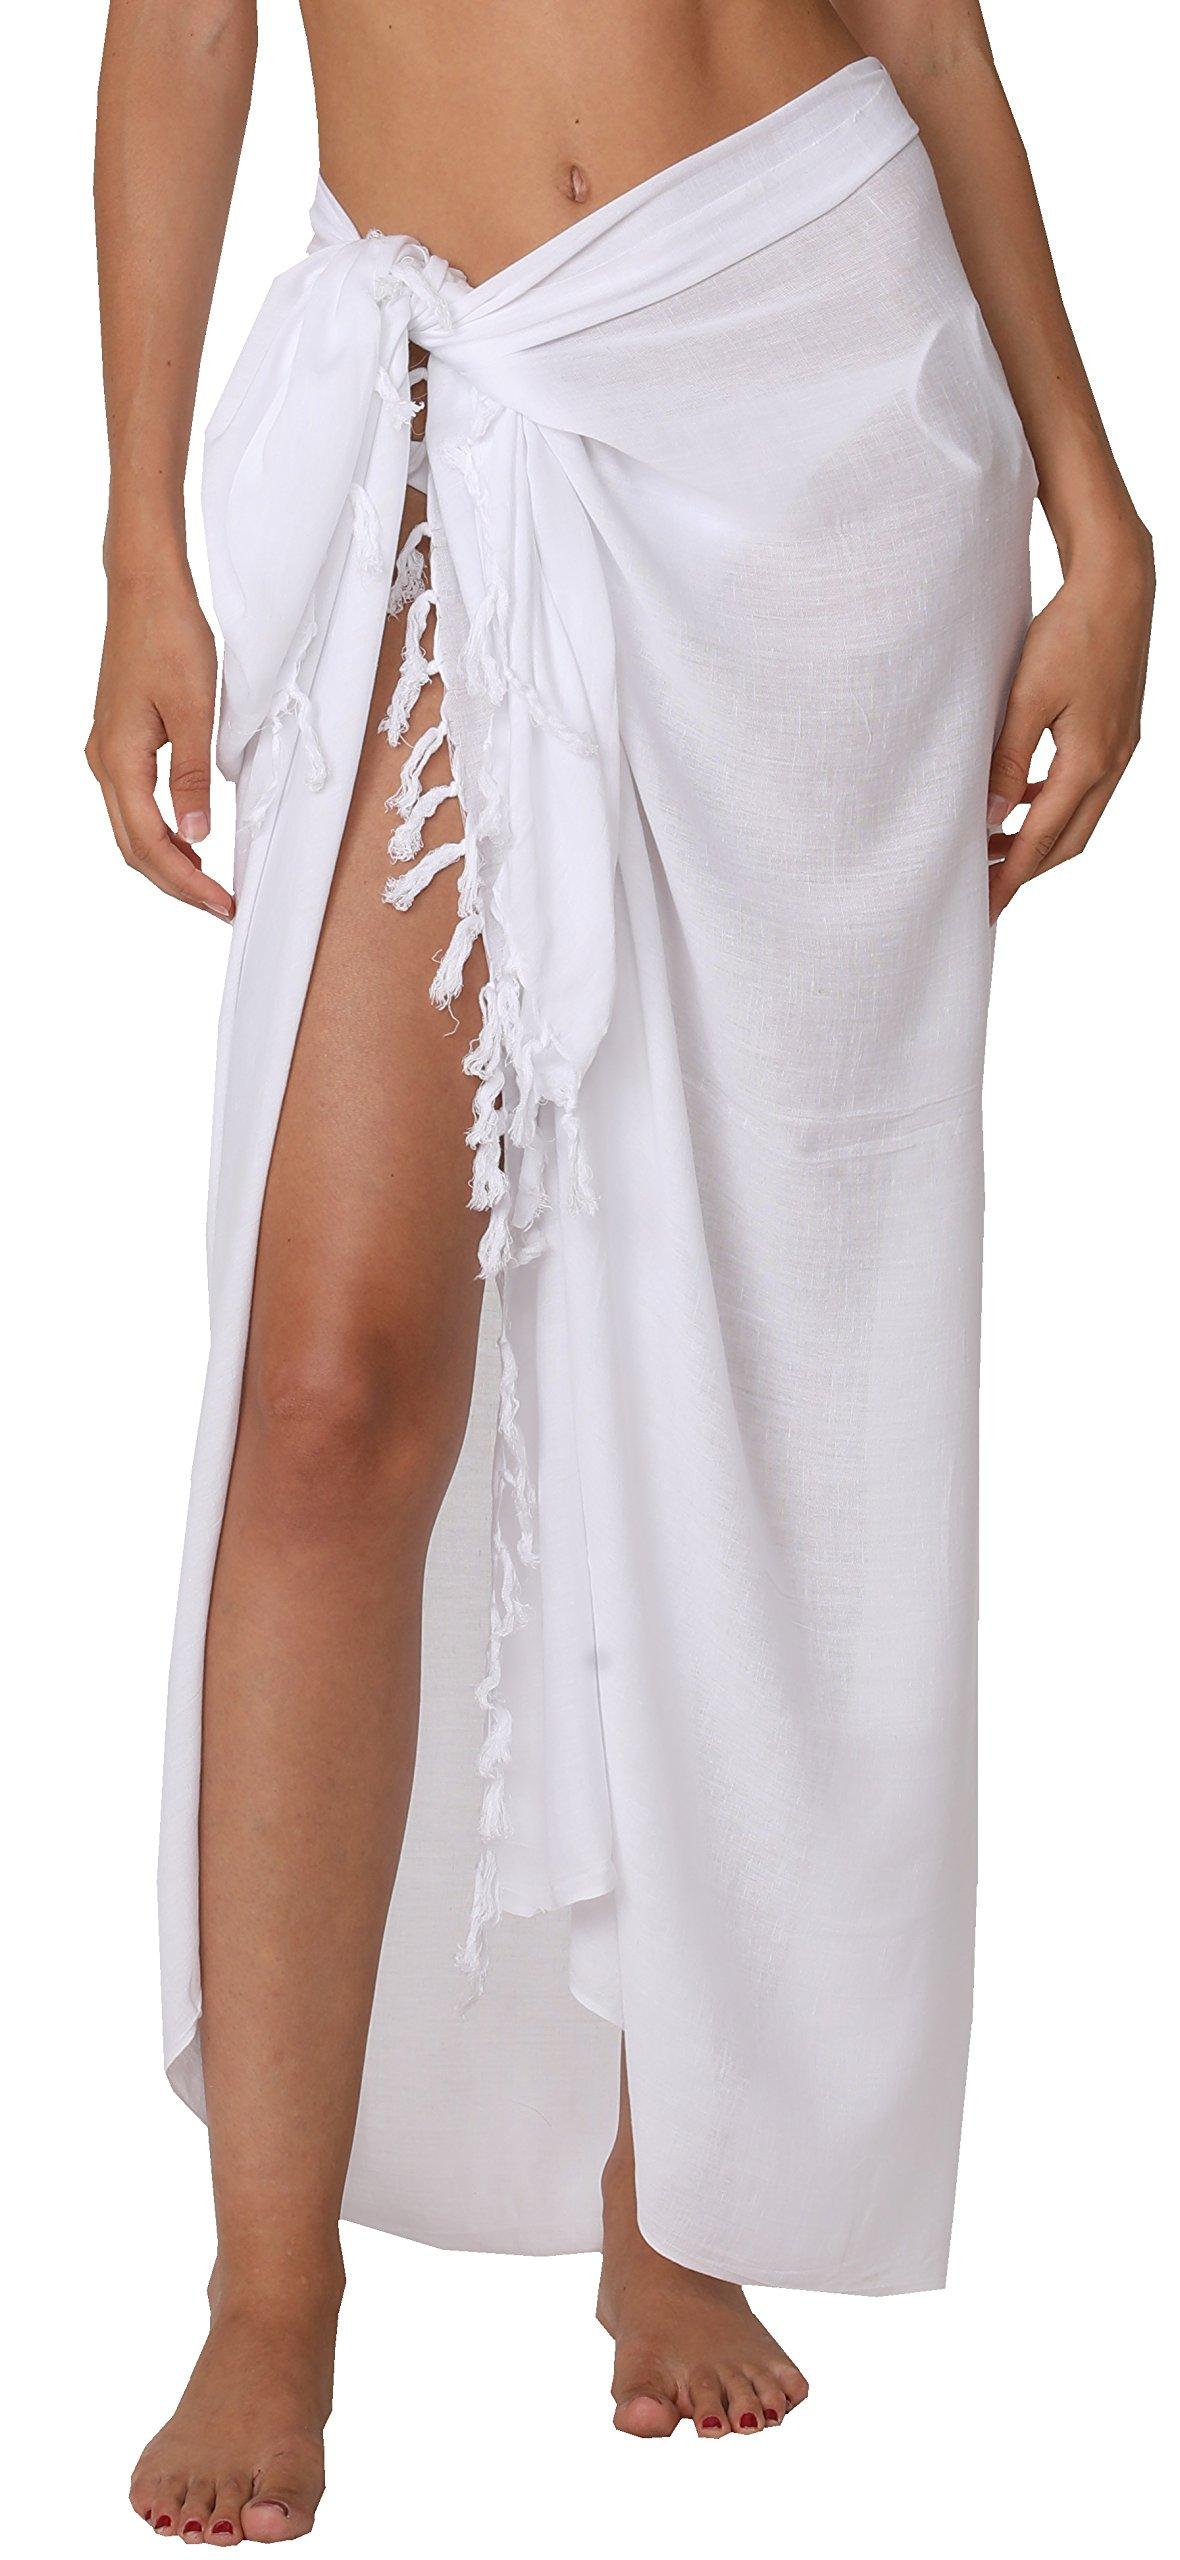 8fdfa80e9dc83 INGEAR Swimwear Long Batik Sarong Multi Wear Pareo Canga Swimsuit Wrap Cover  Up (One Size